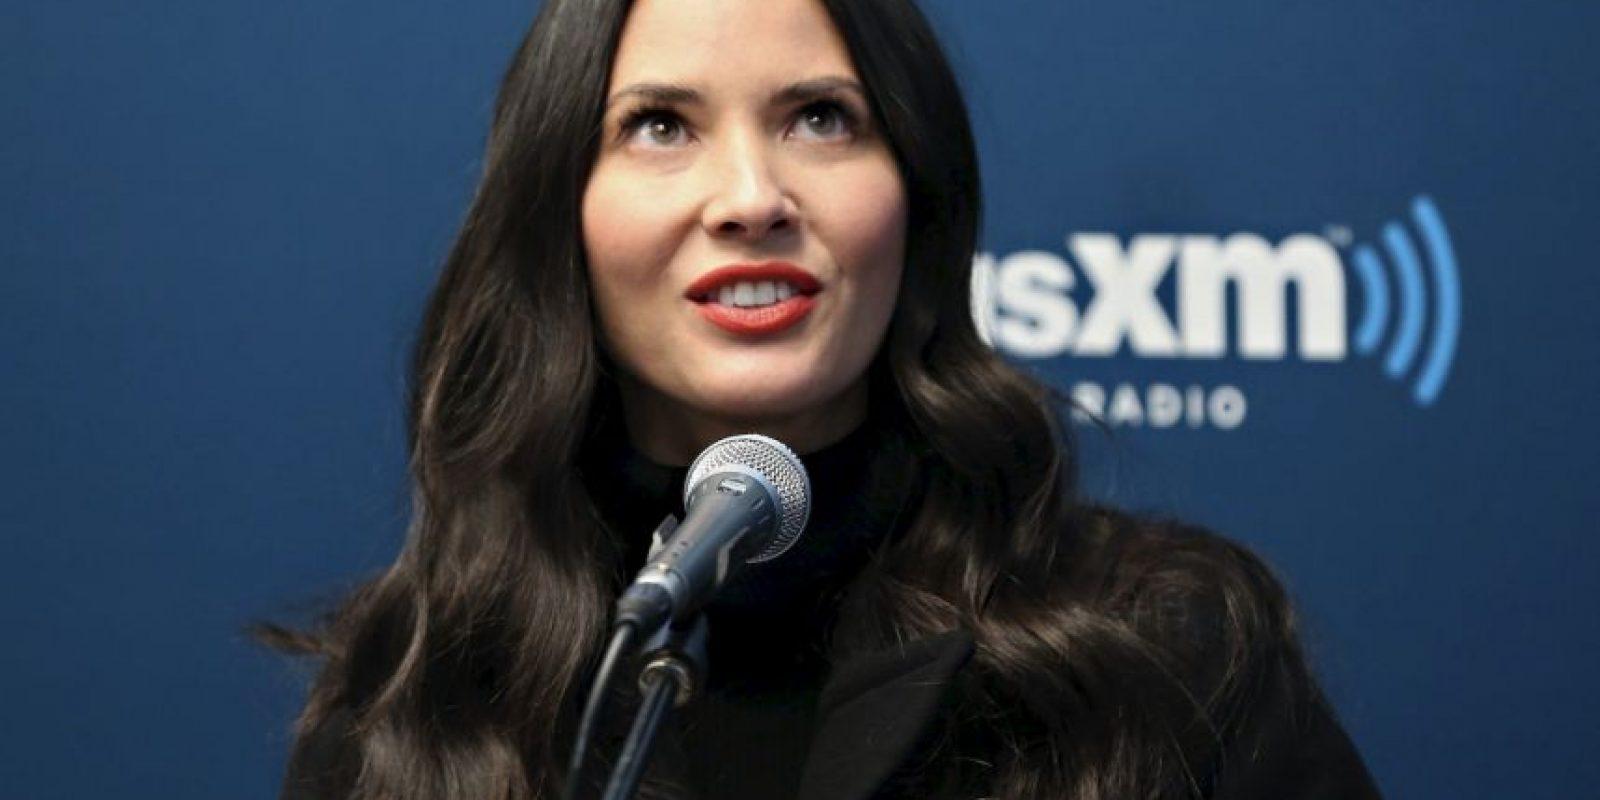 Su nombre completo es Lisa Olivia Munn Foto:Getty Images